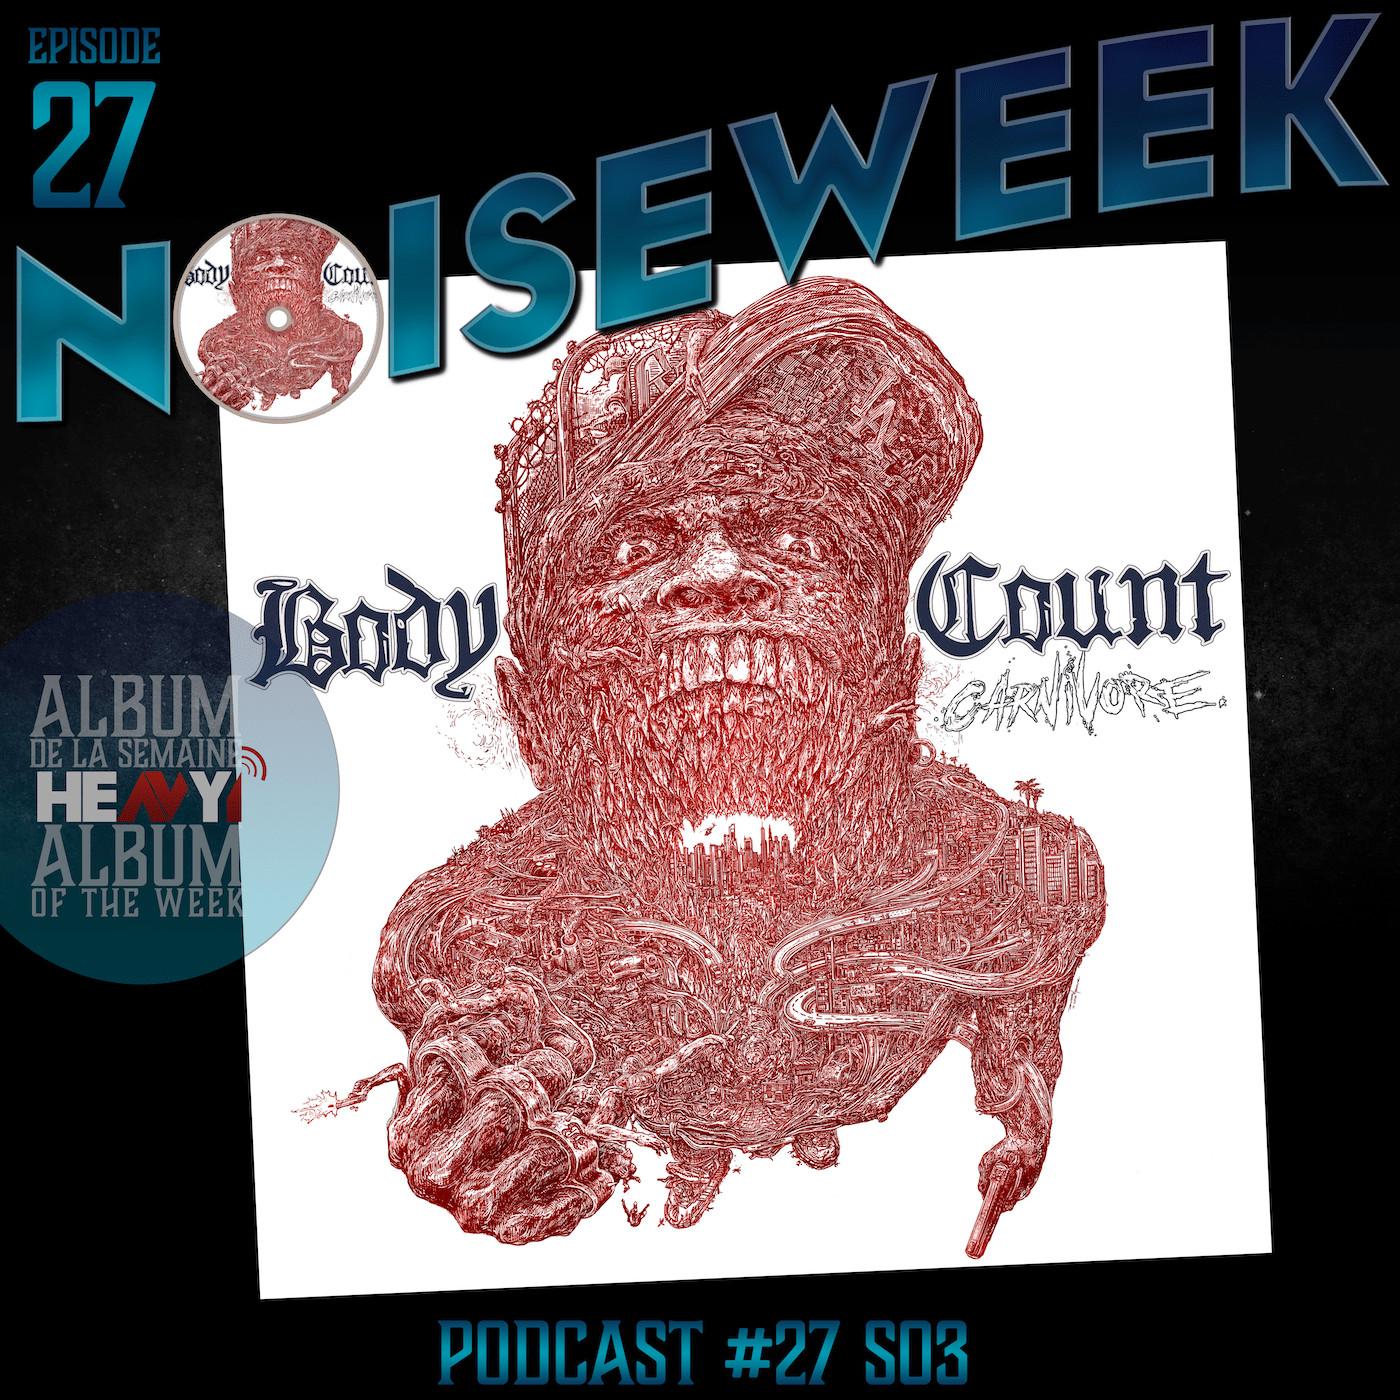 Noiseweek #27 Saison 3